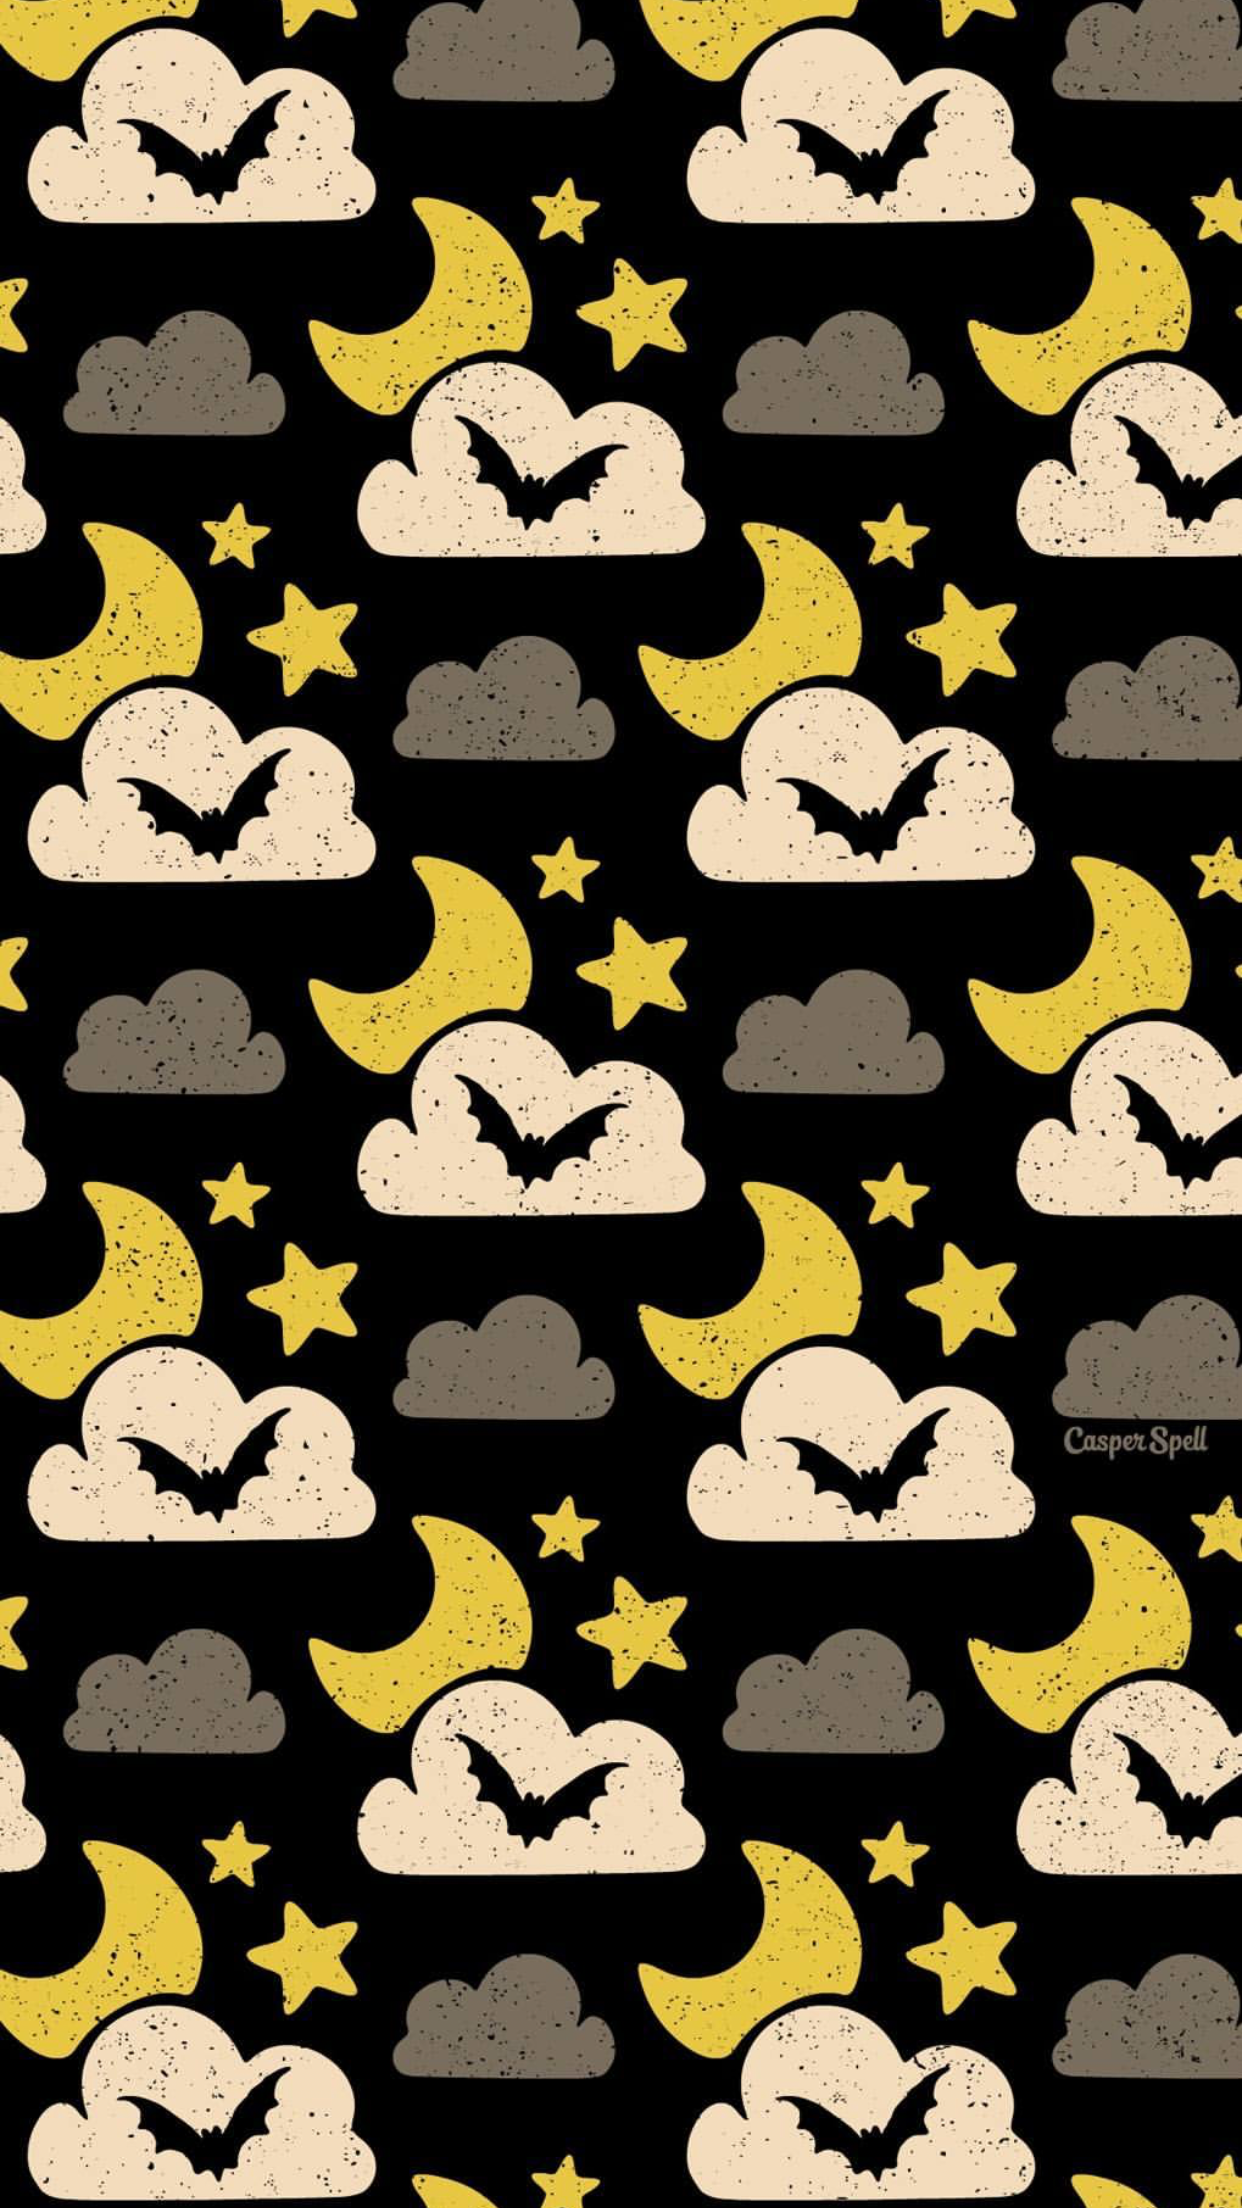 Moon Star Bat Halloween Wallpaper By Artist Casper Spell